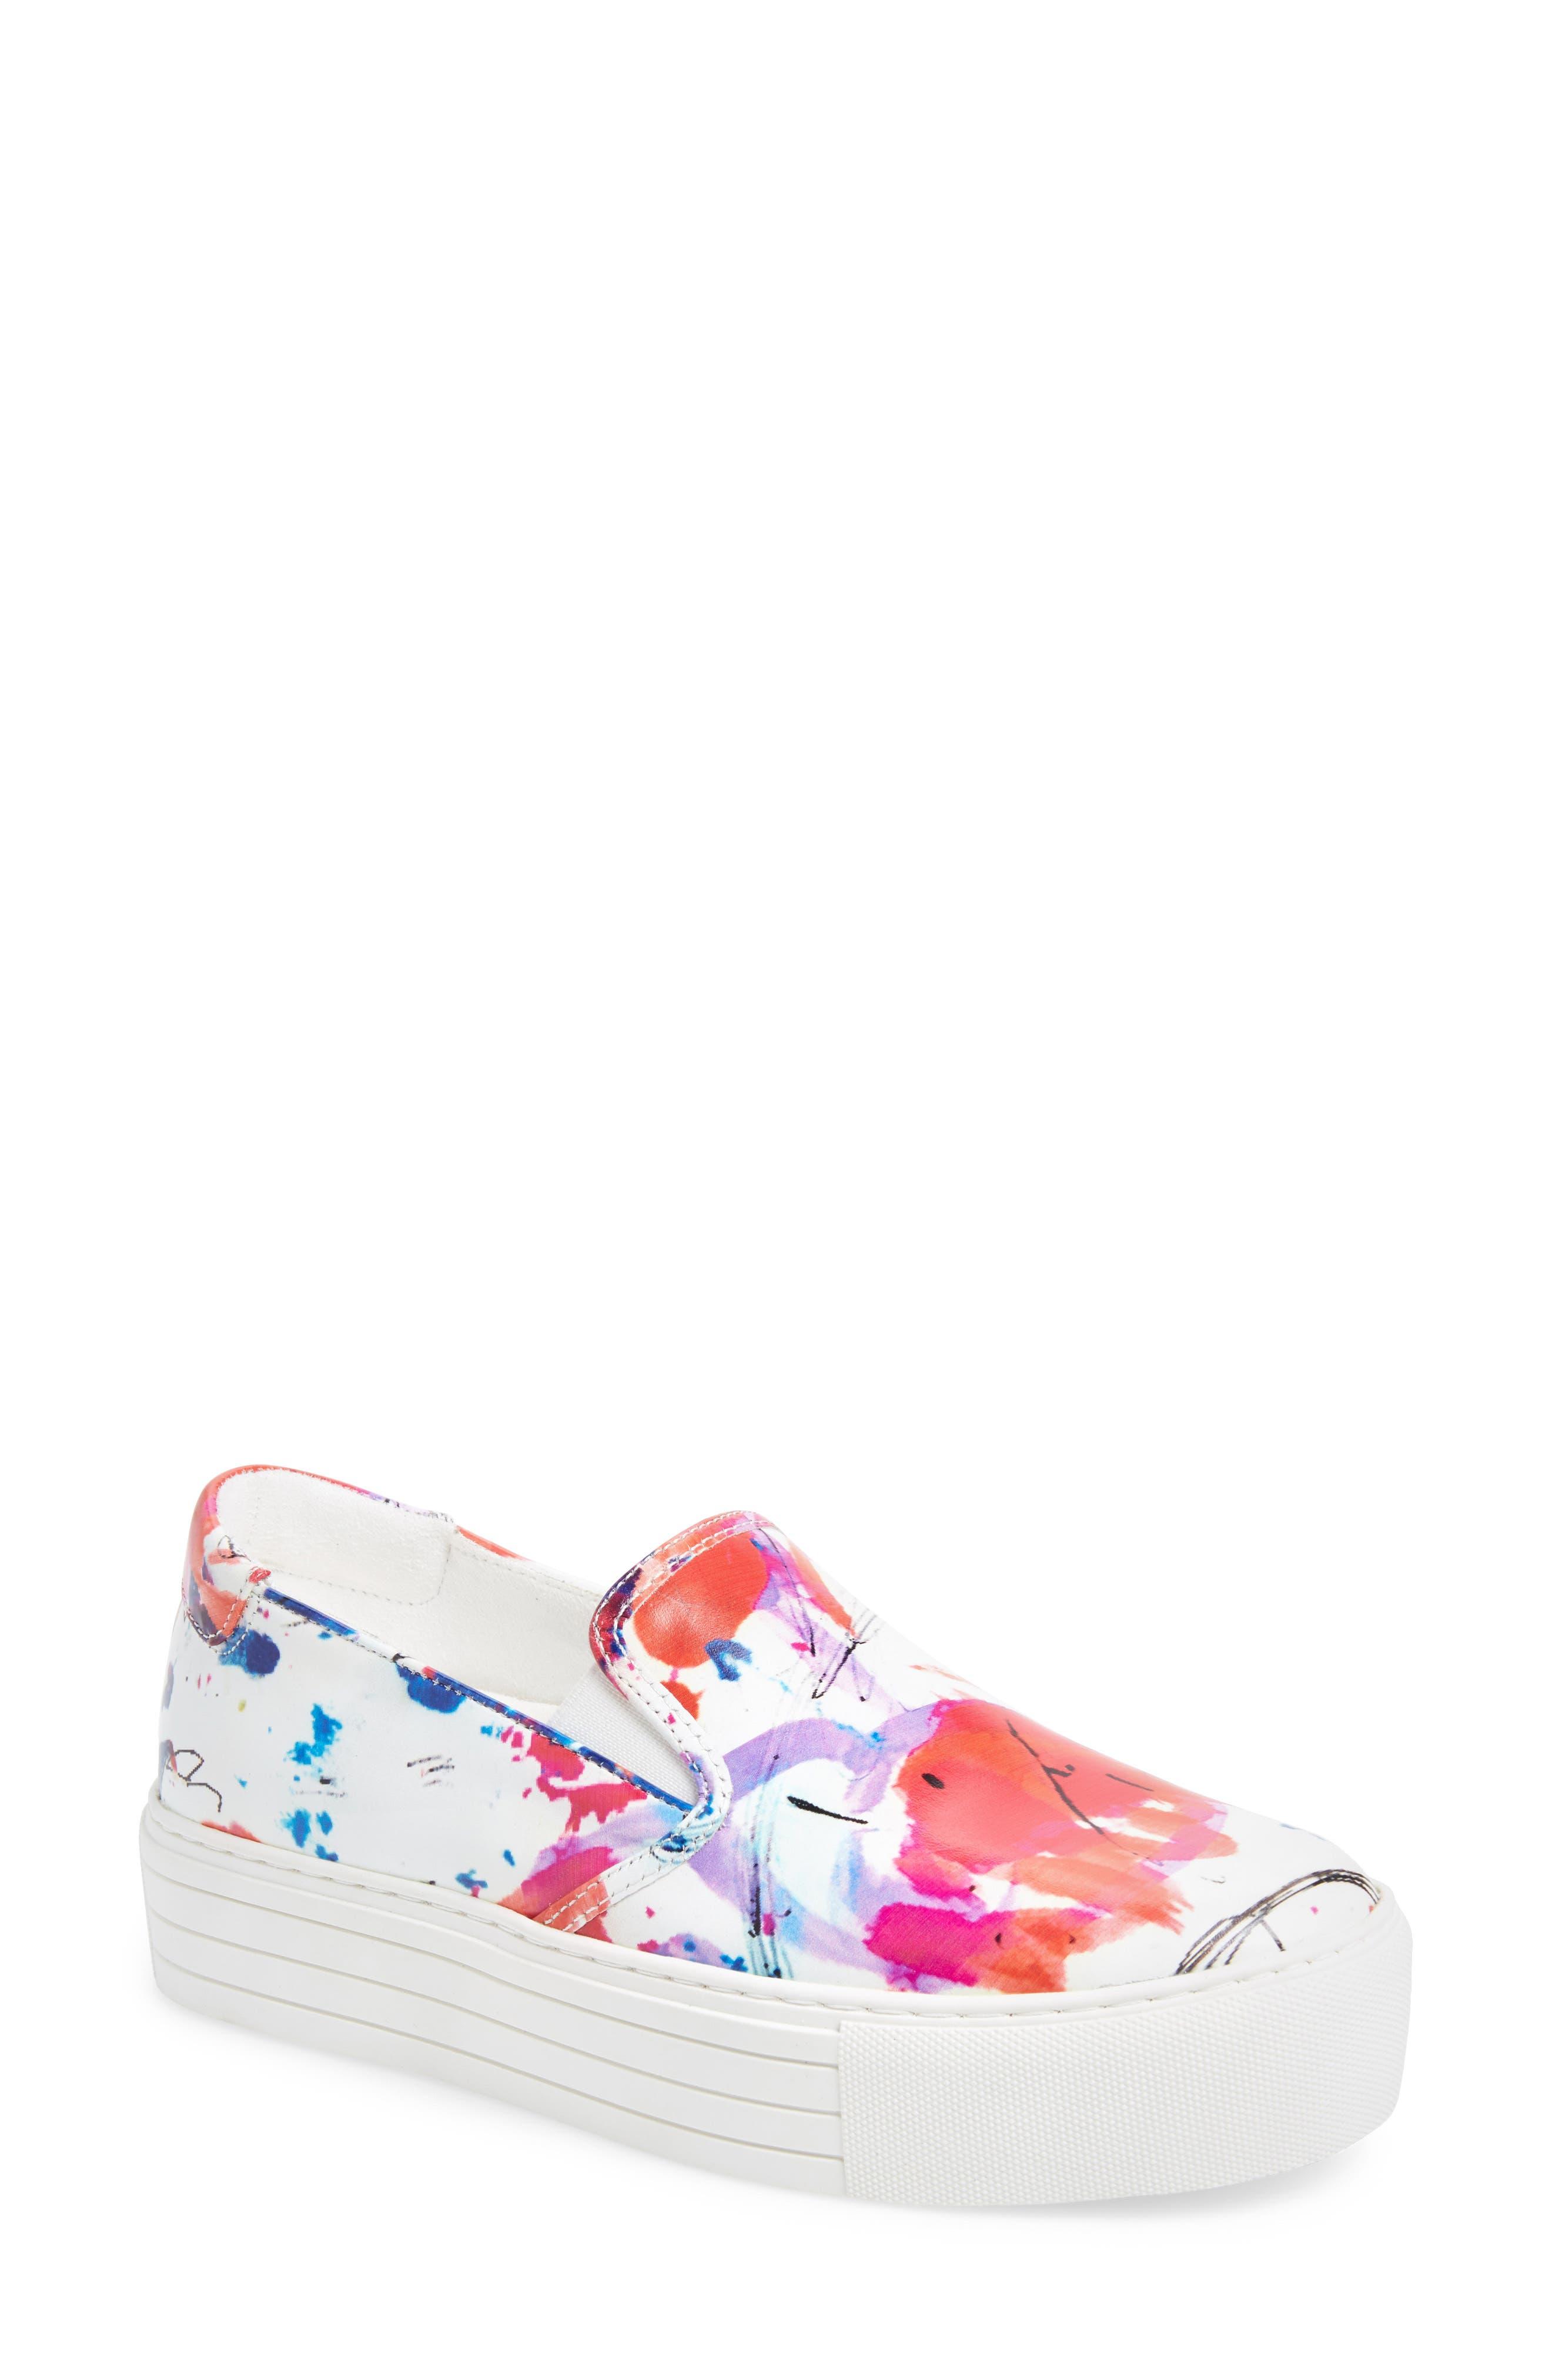 Joanie Slip-On Platform Sneaker,                         Main,                         color, White Multi Print Leather